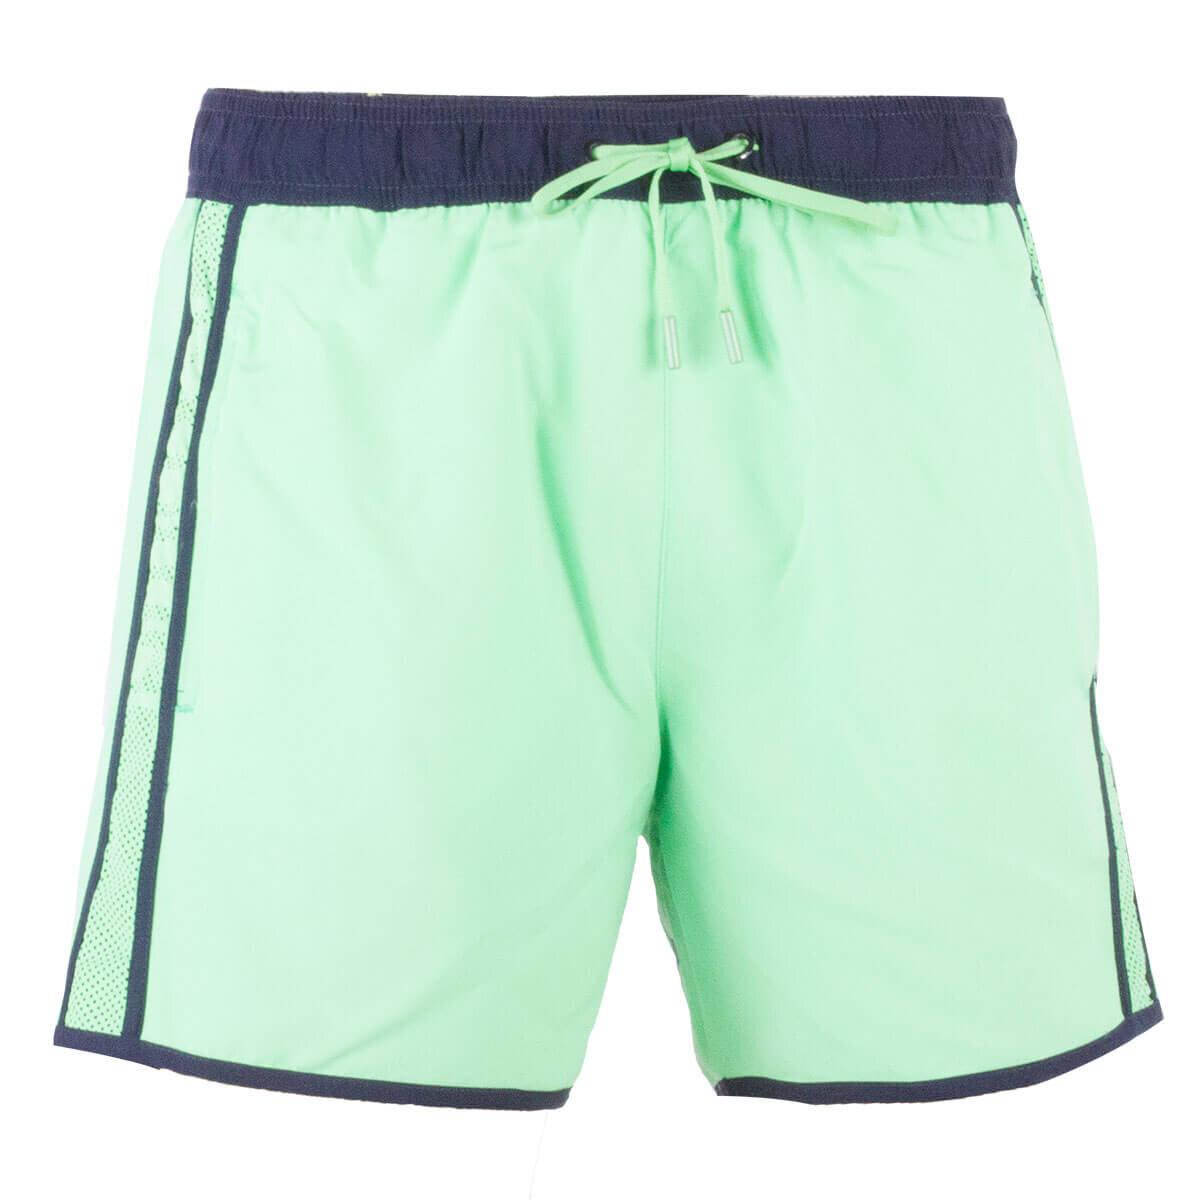 Lime Erkek Şort - Mayo 381500-54Z